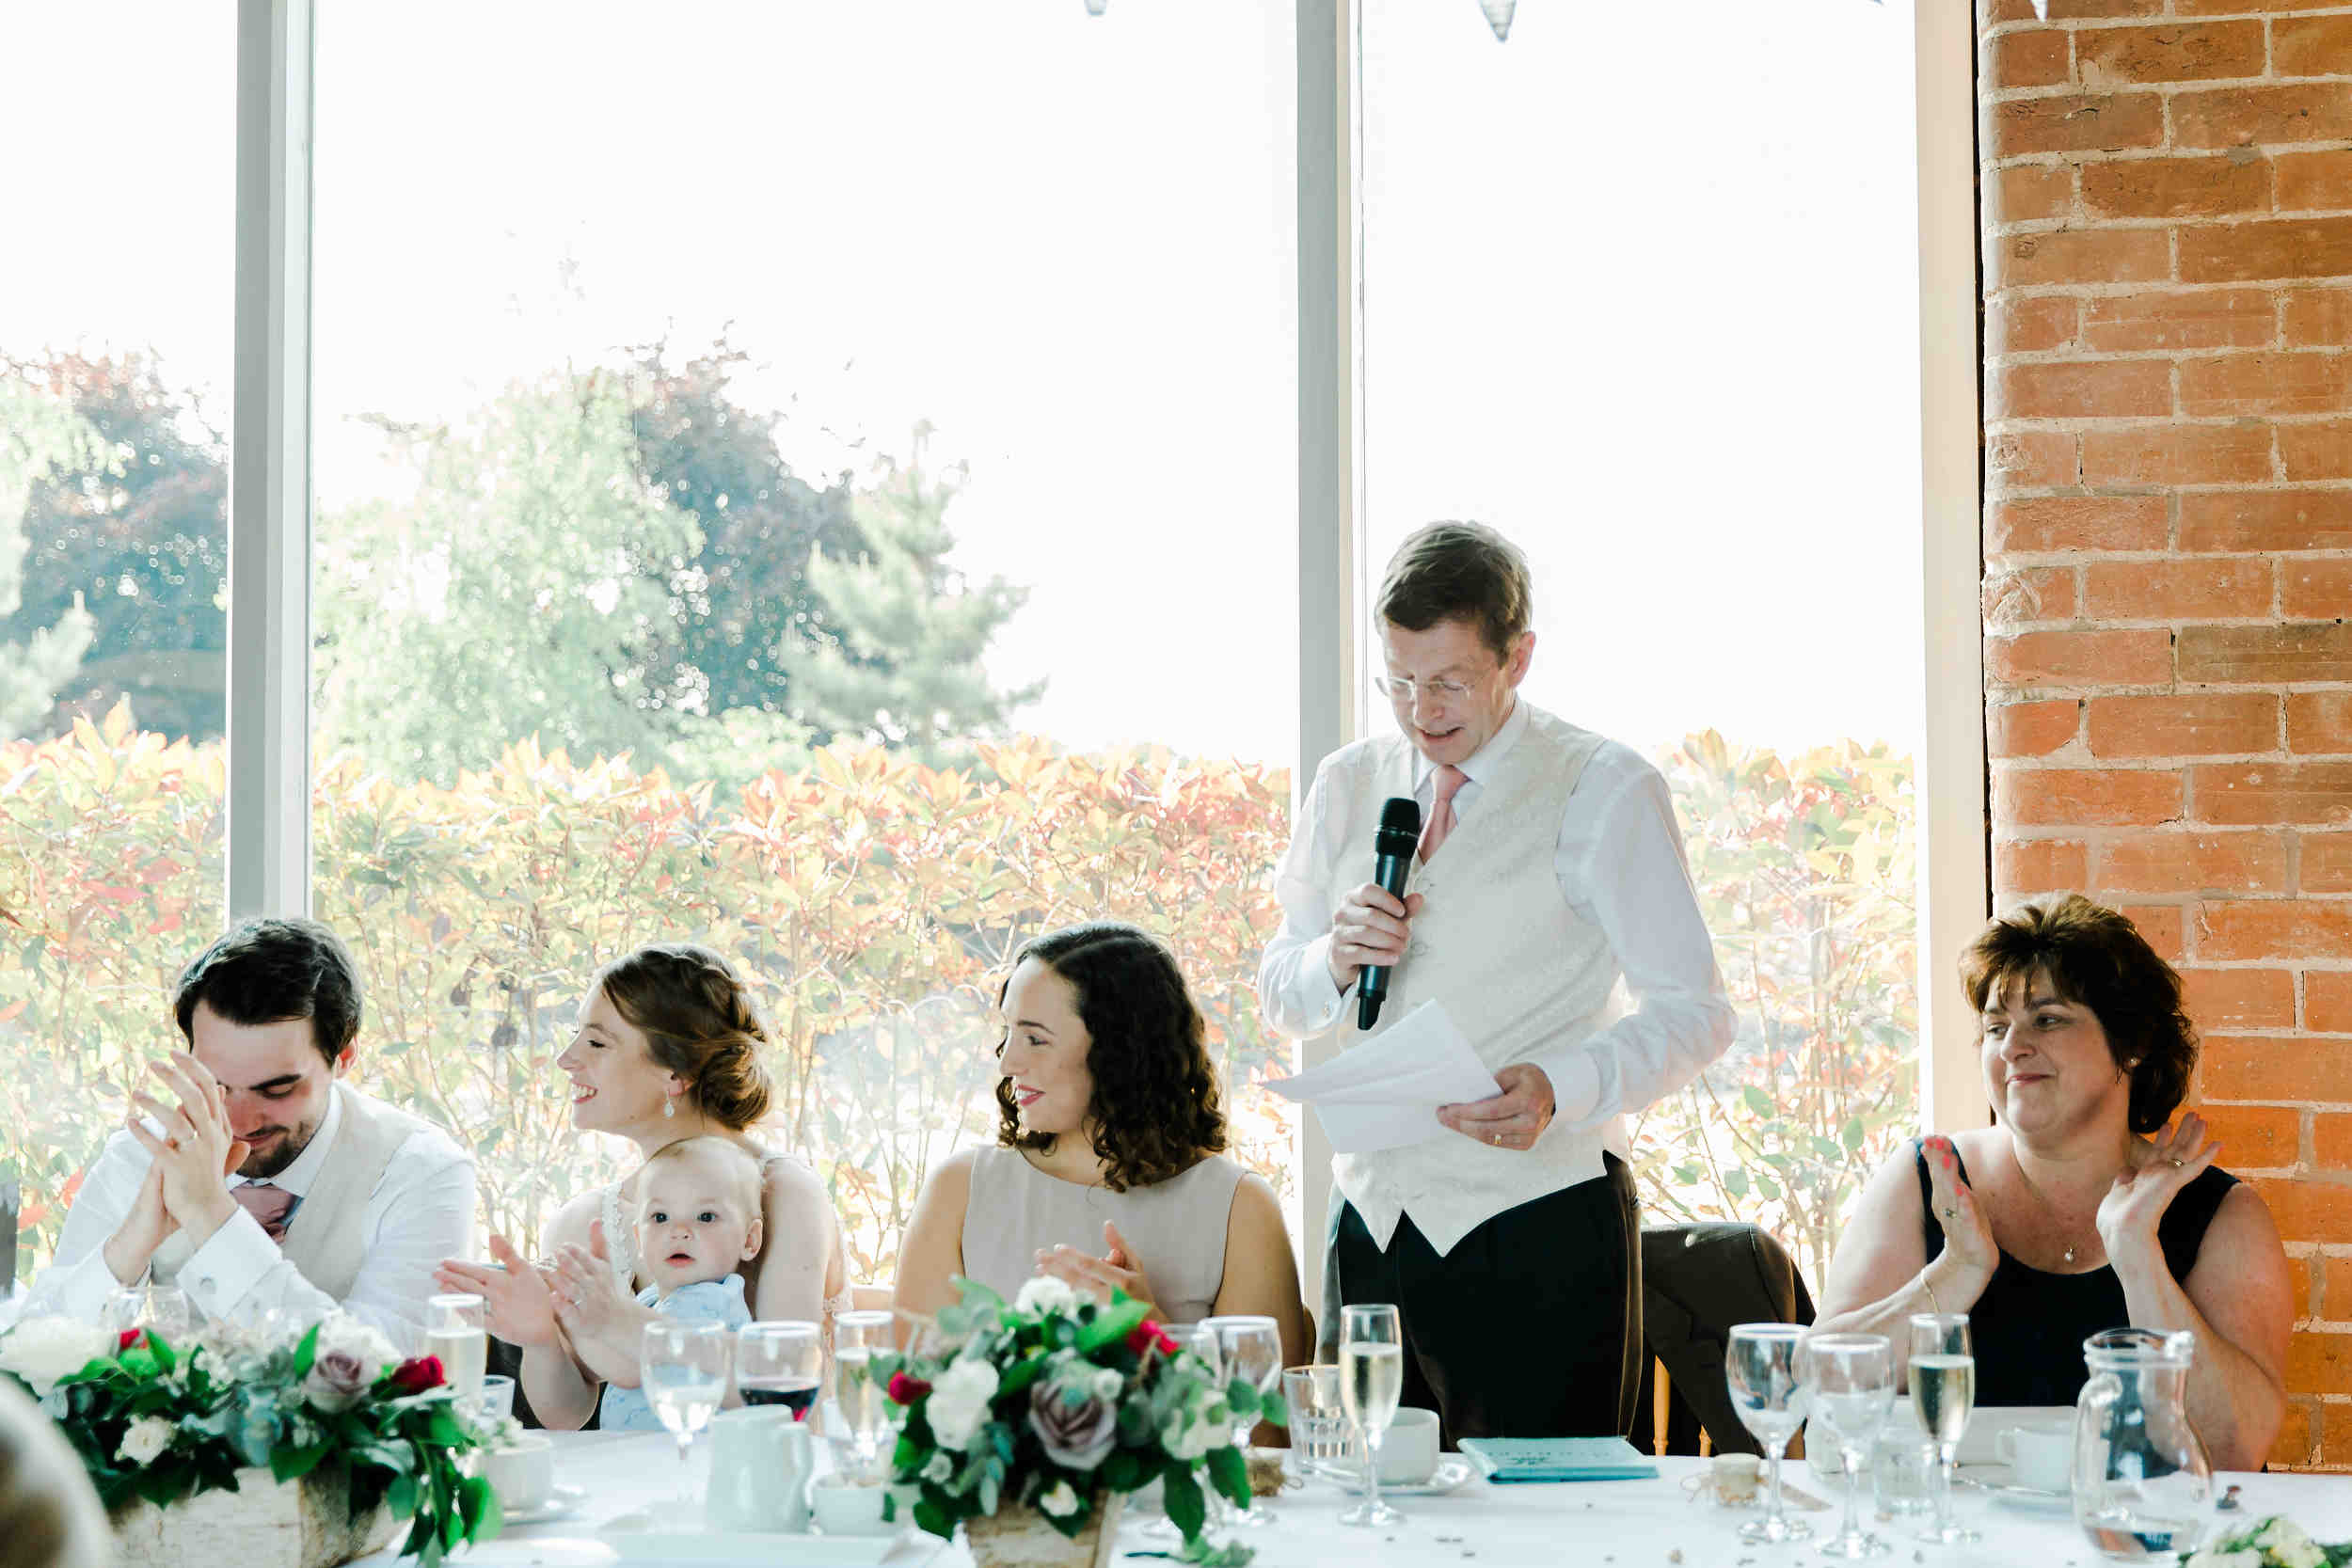 Modern_Stylish_Wedding_at_Swallows_Nest_Barn1246